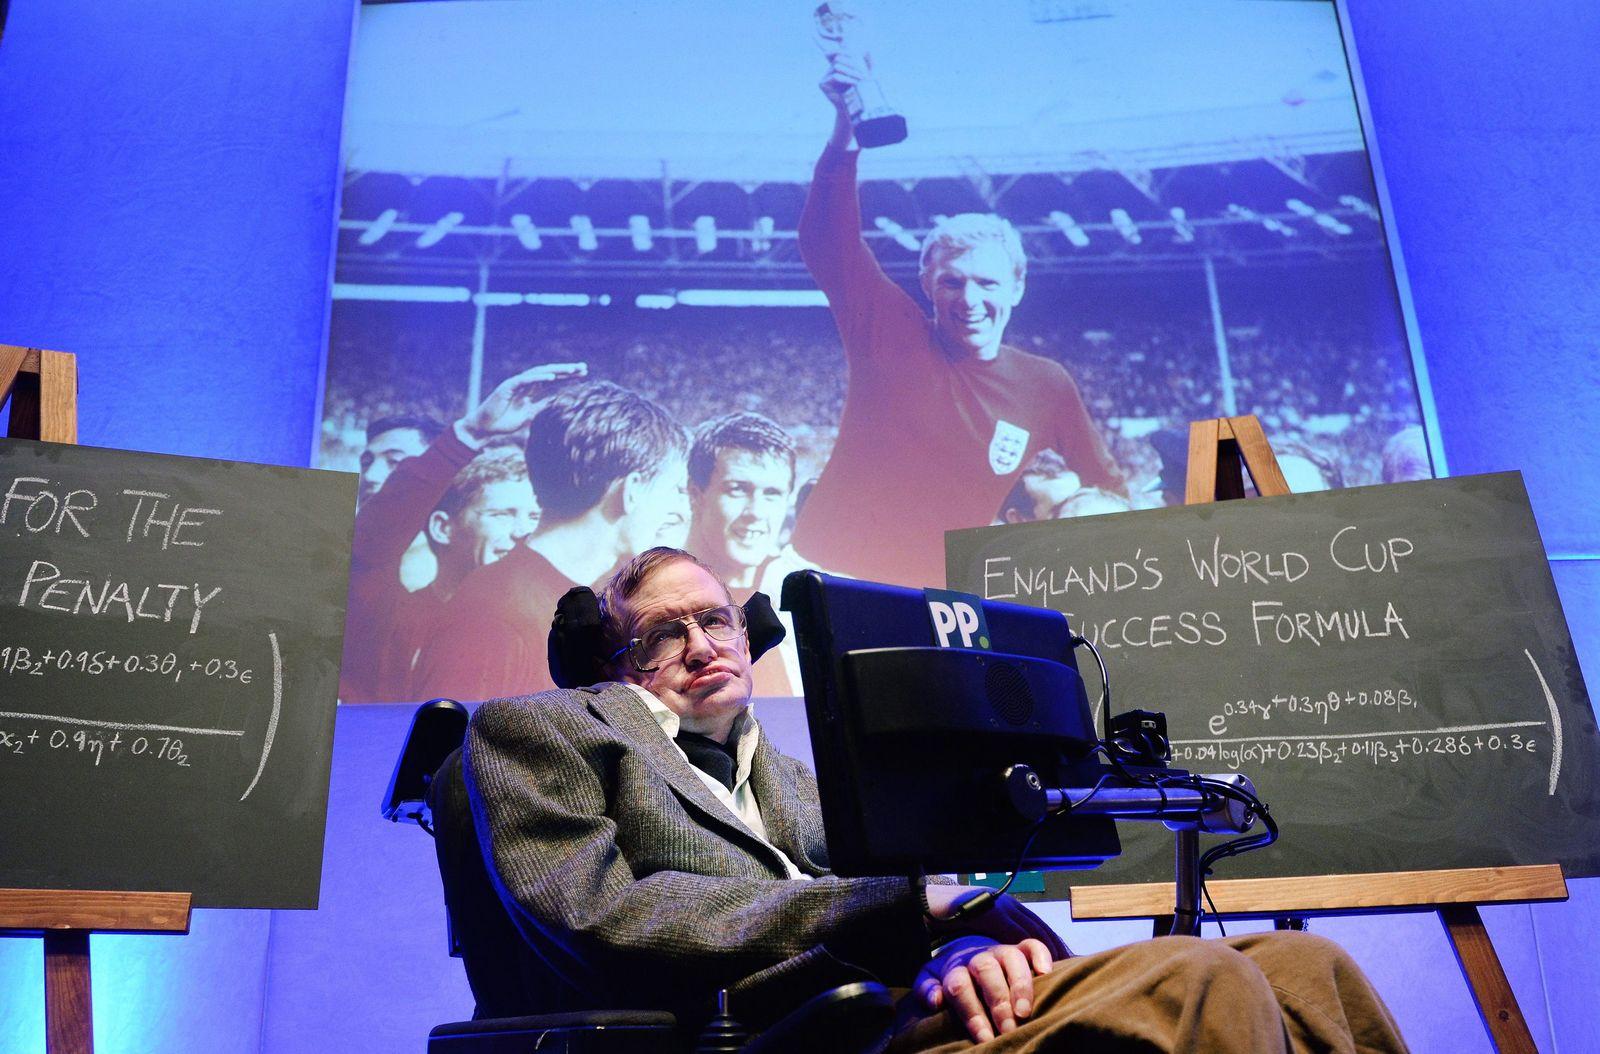 Professor Stephen Hawking develops formula for England to win 201